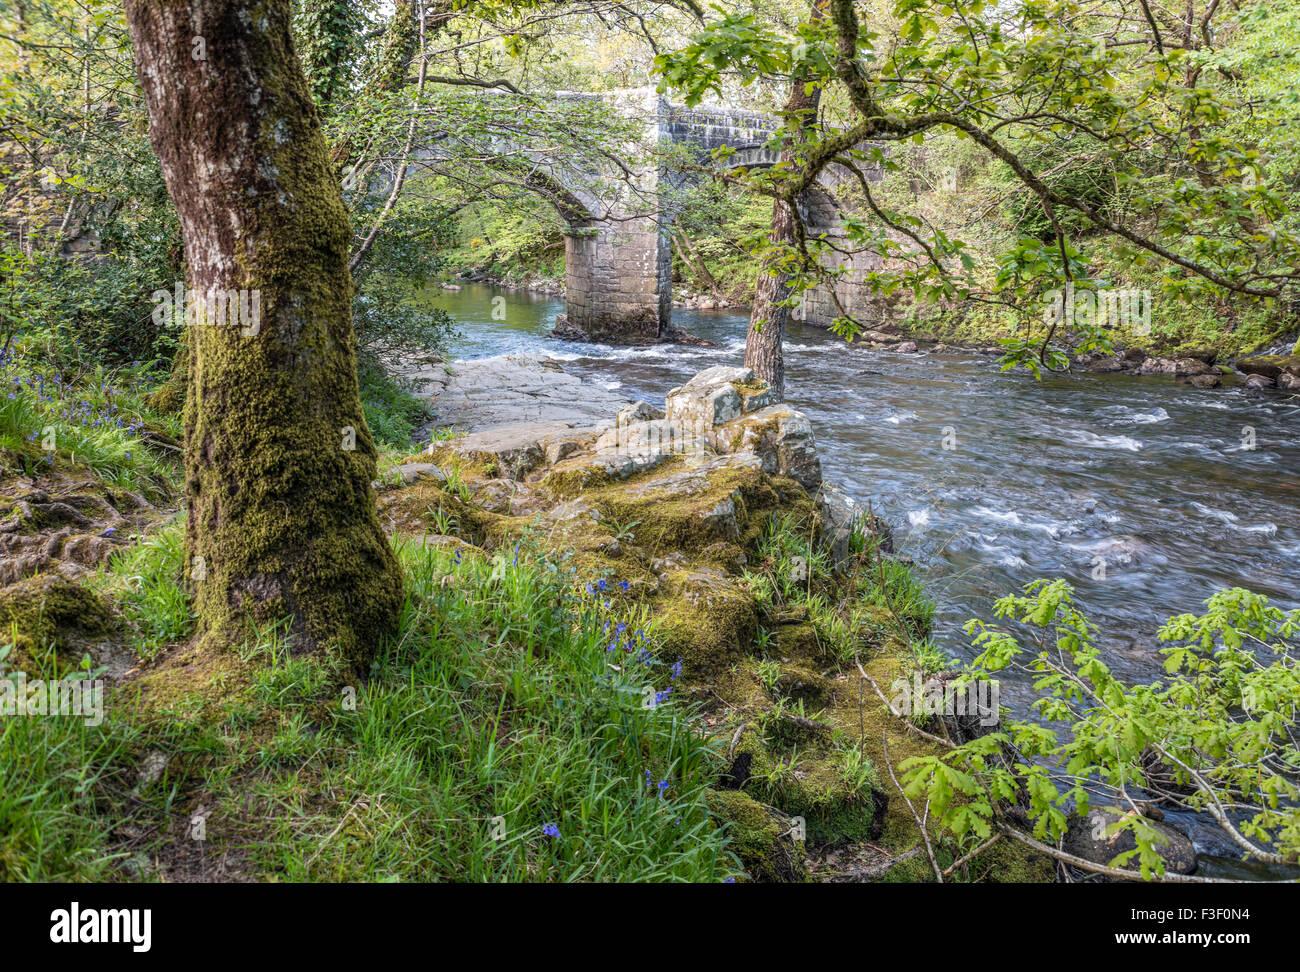 Riverside oak forest at Dartmoor National Park, Devon, England, UK | Landschaft im Dartmoor National Park, Devon, - Stock Image